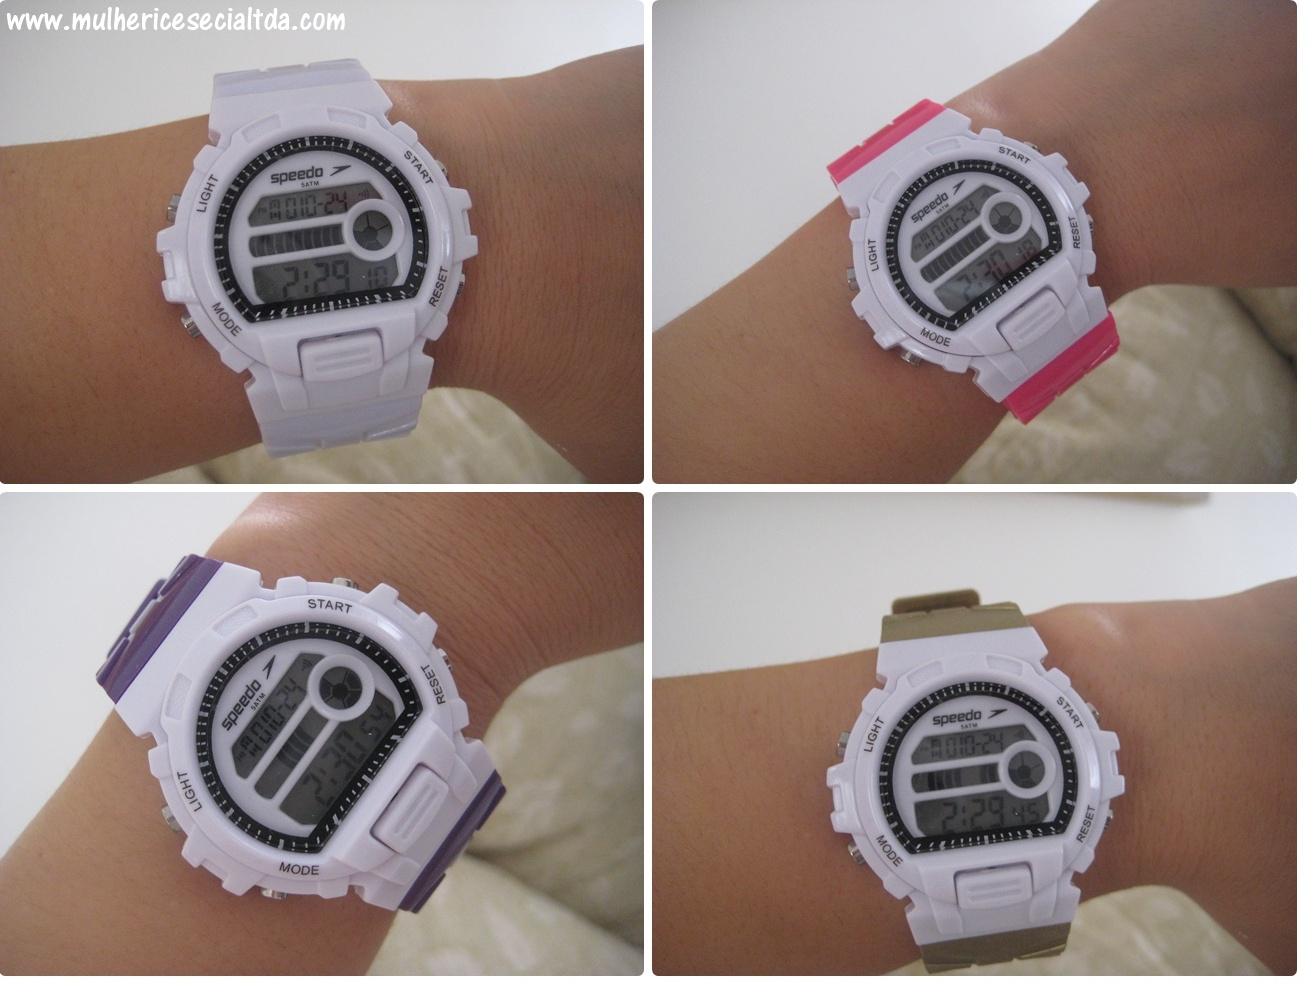 2d30b6fde50 O relógio Speedo Loop é super bacana porque além de trocar as pulseiras  (existem mais de 5 kits diferentes de coresde pulseiras)